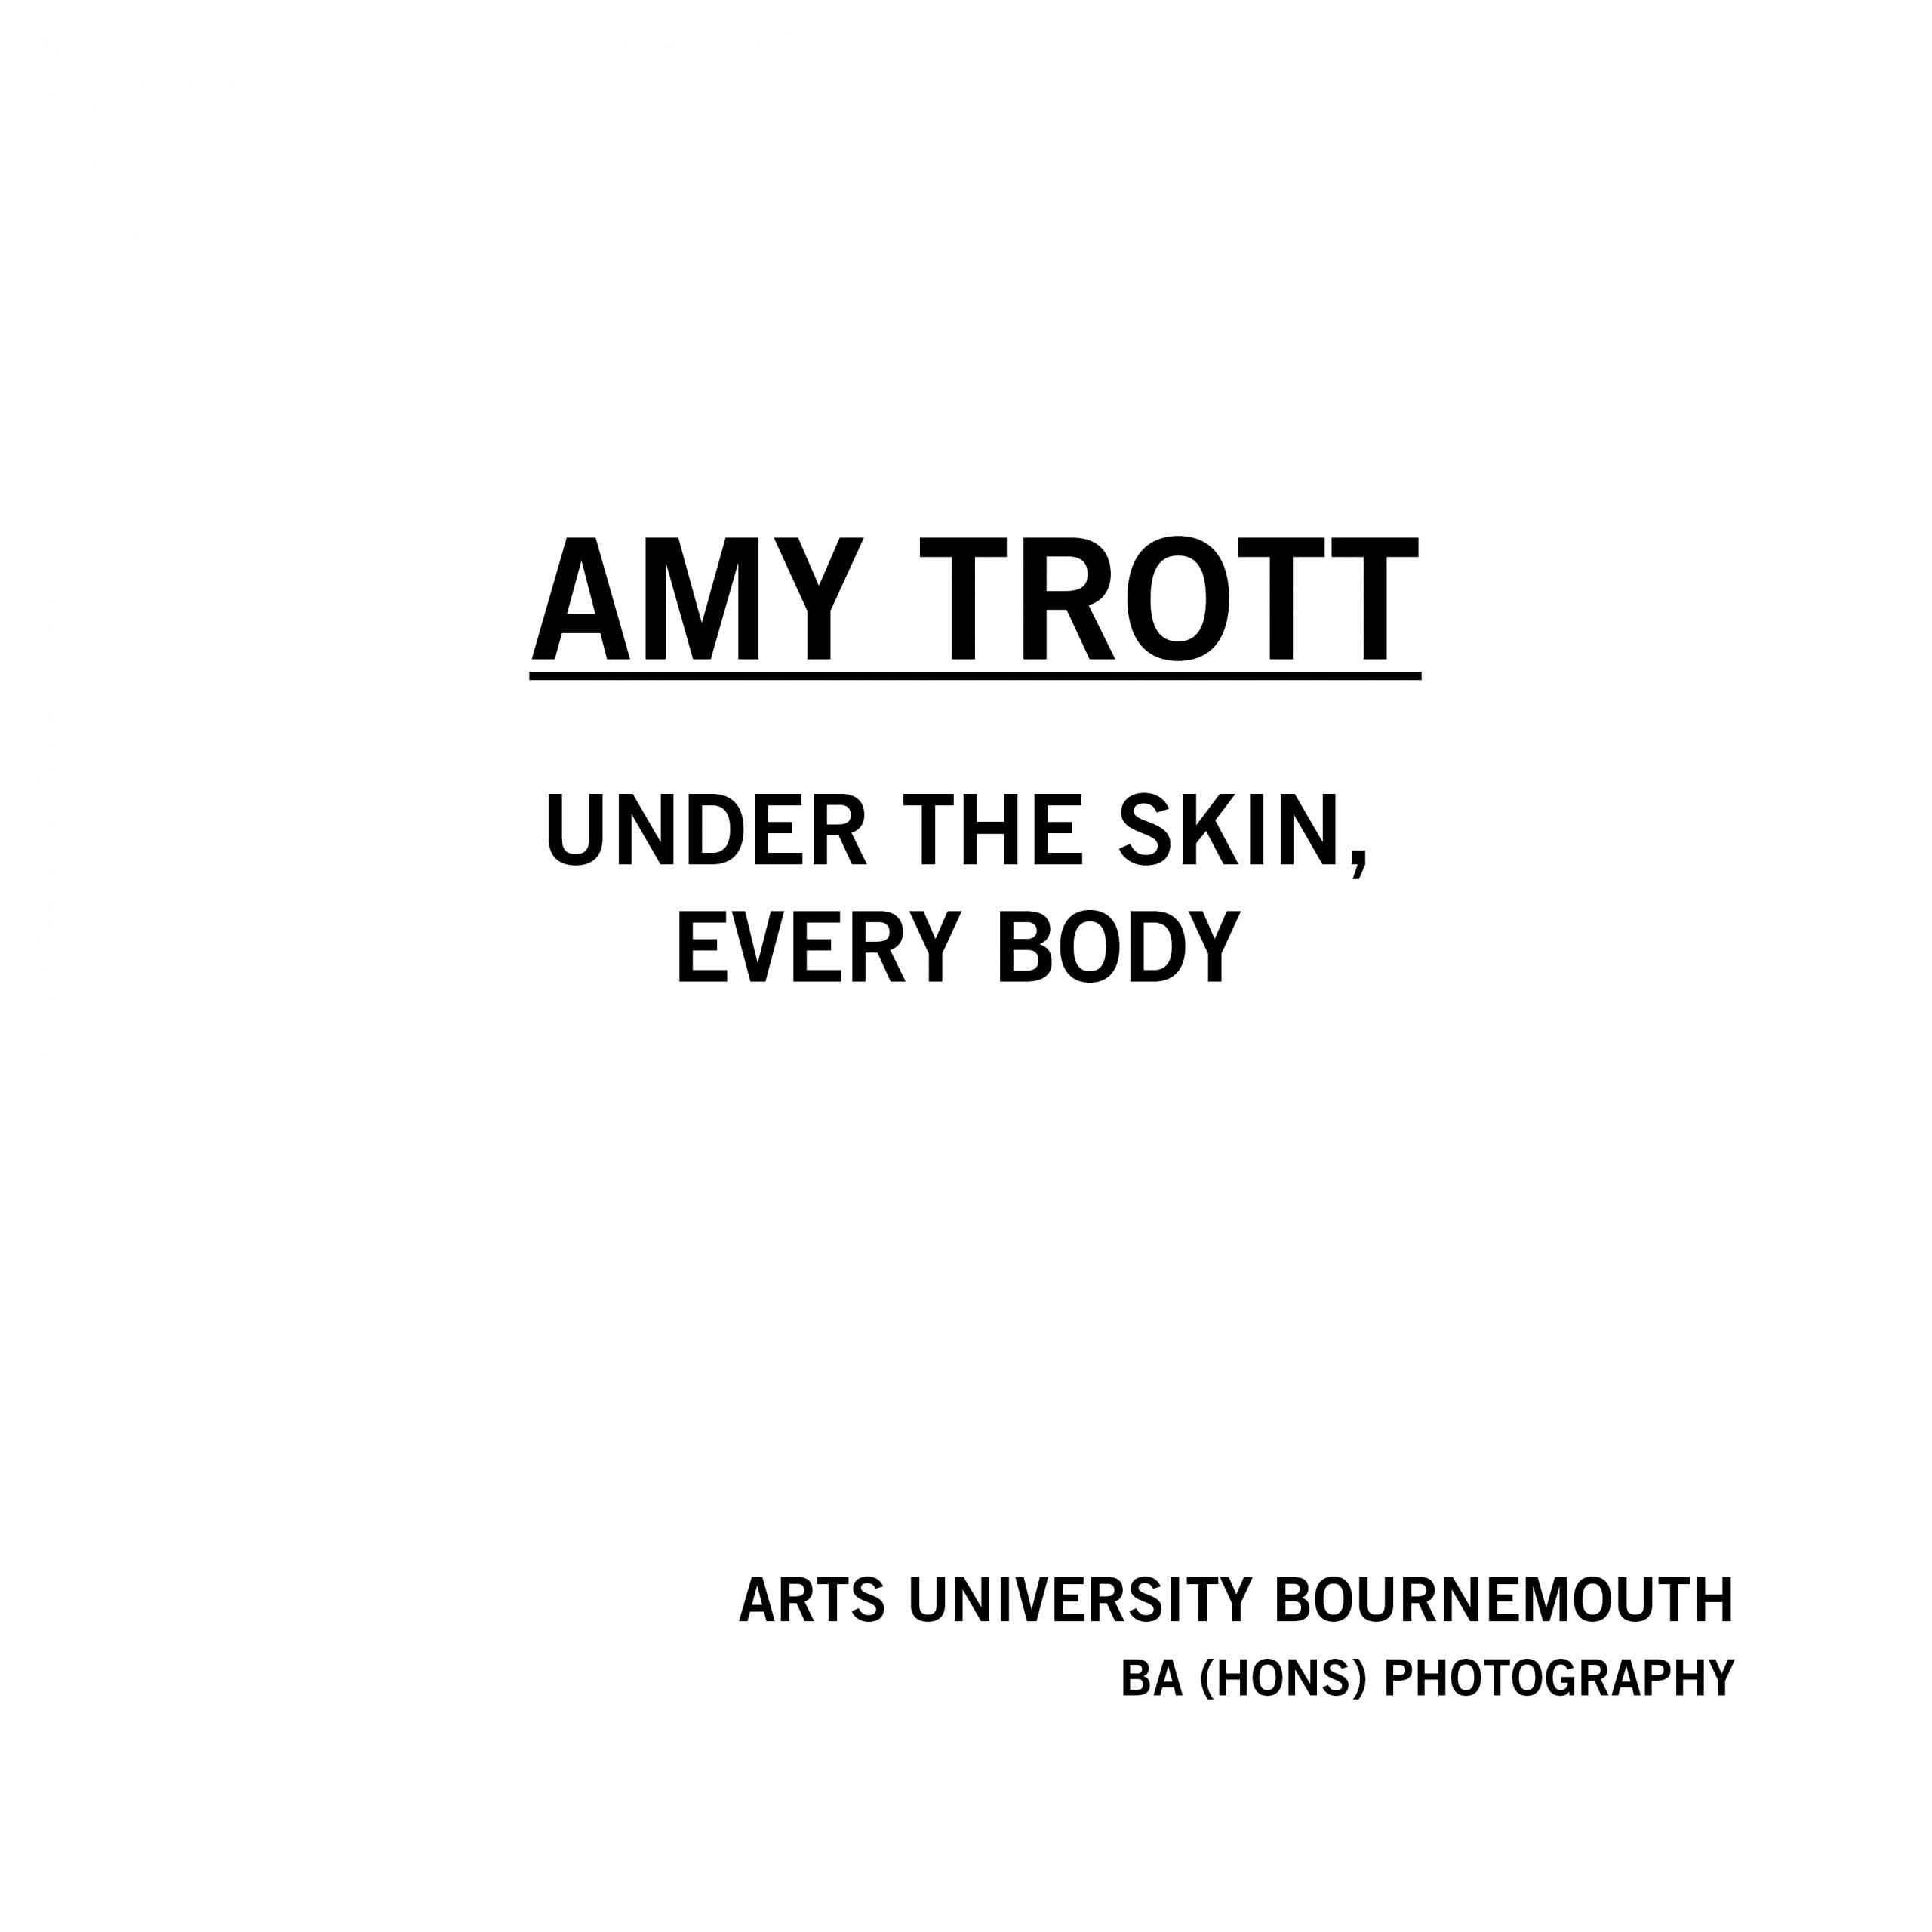 Amy Trott - Under The Skin, Every Body